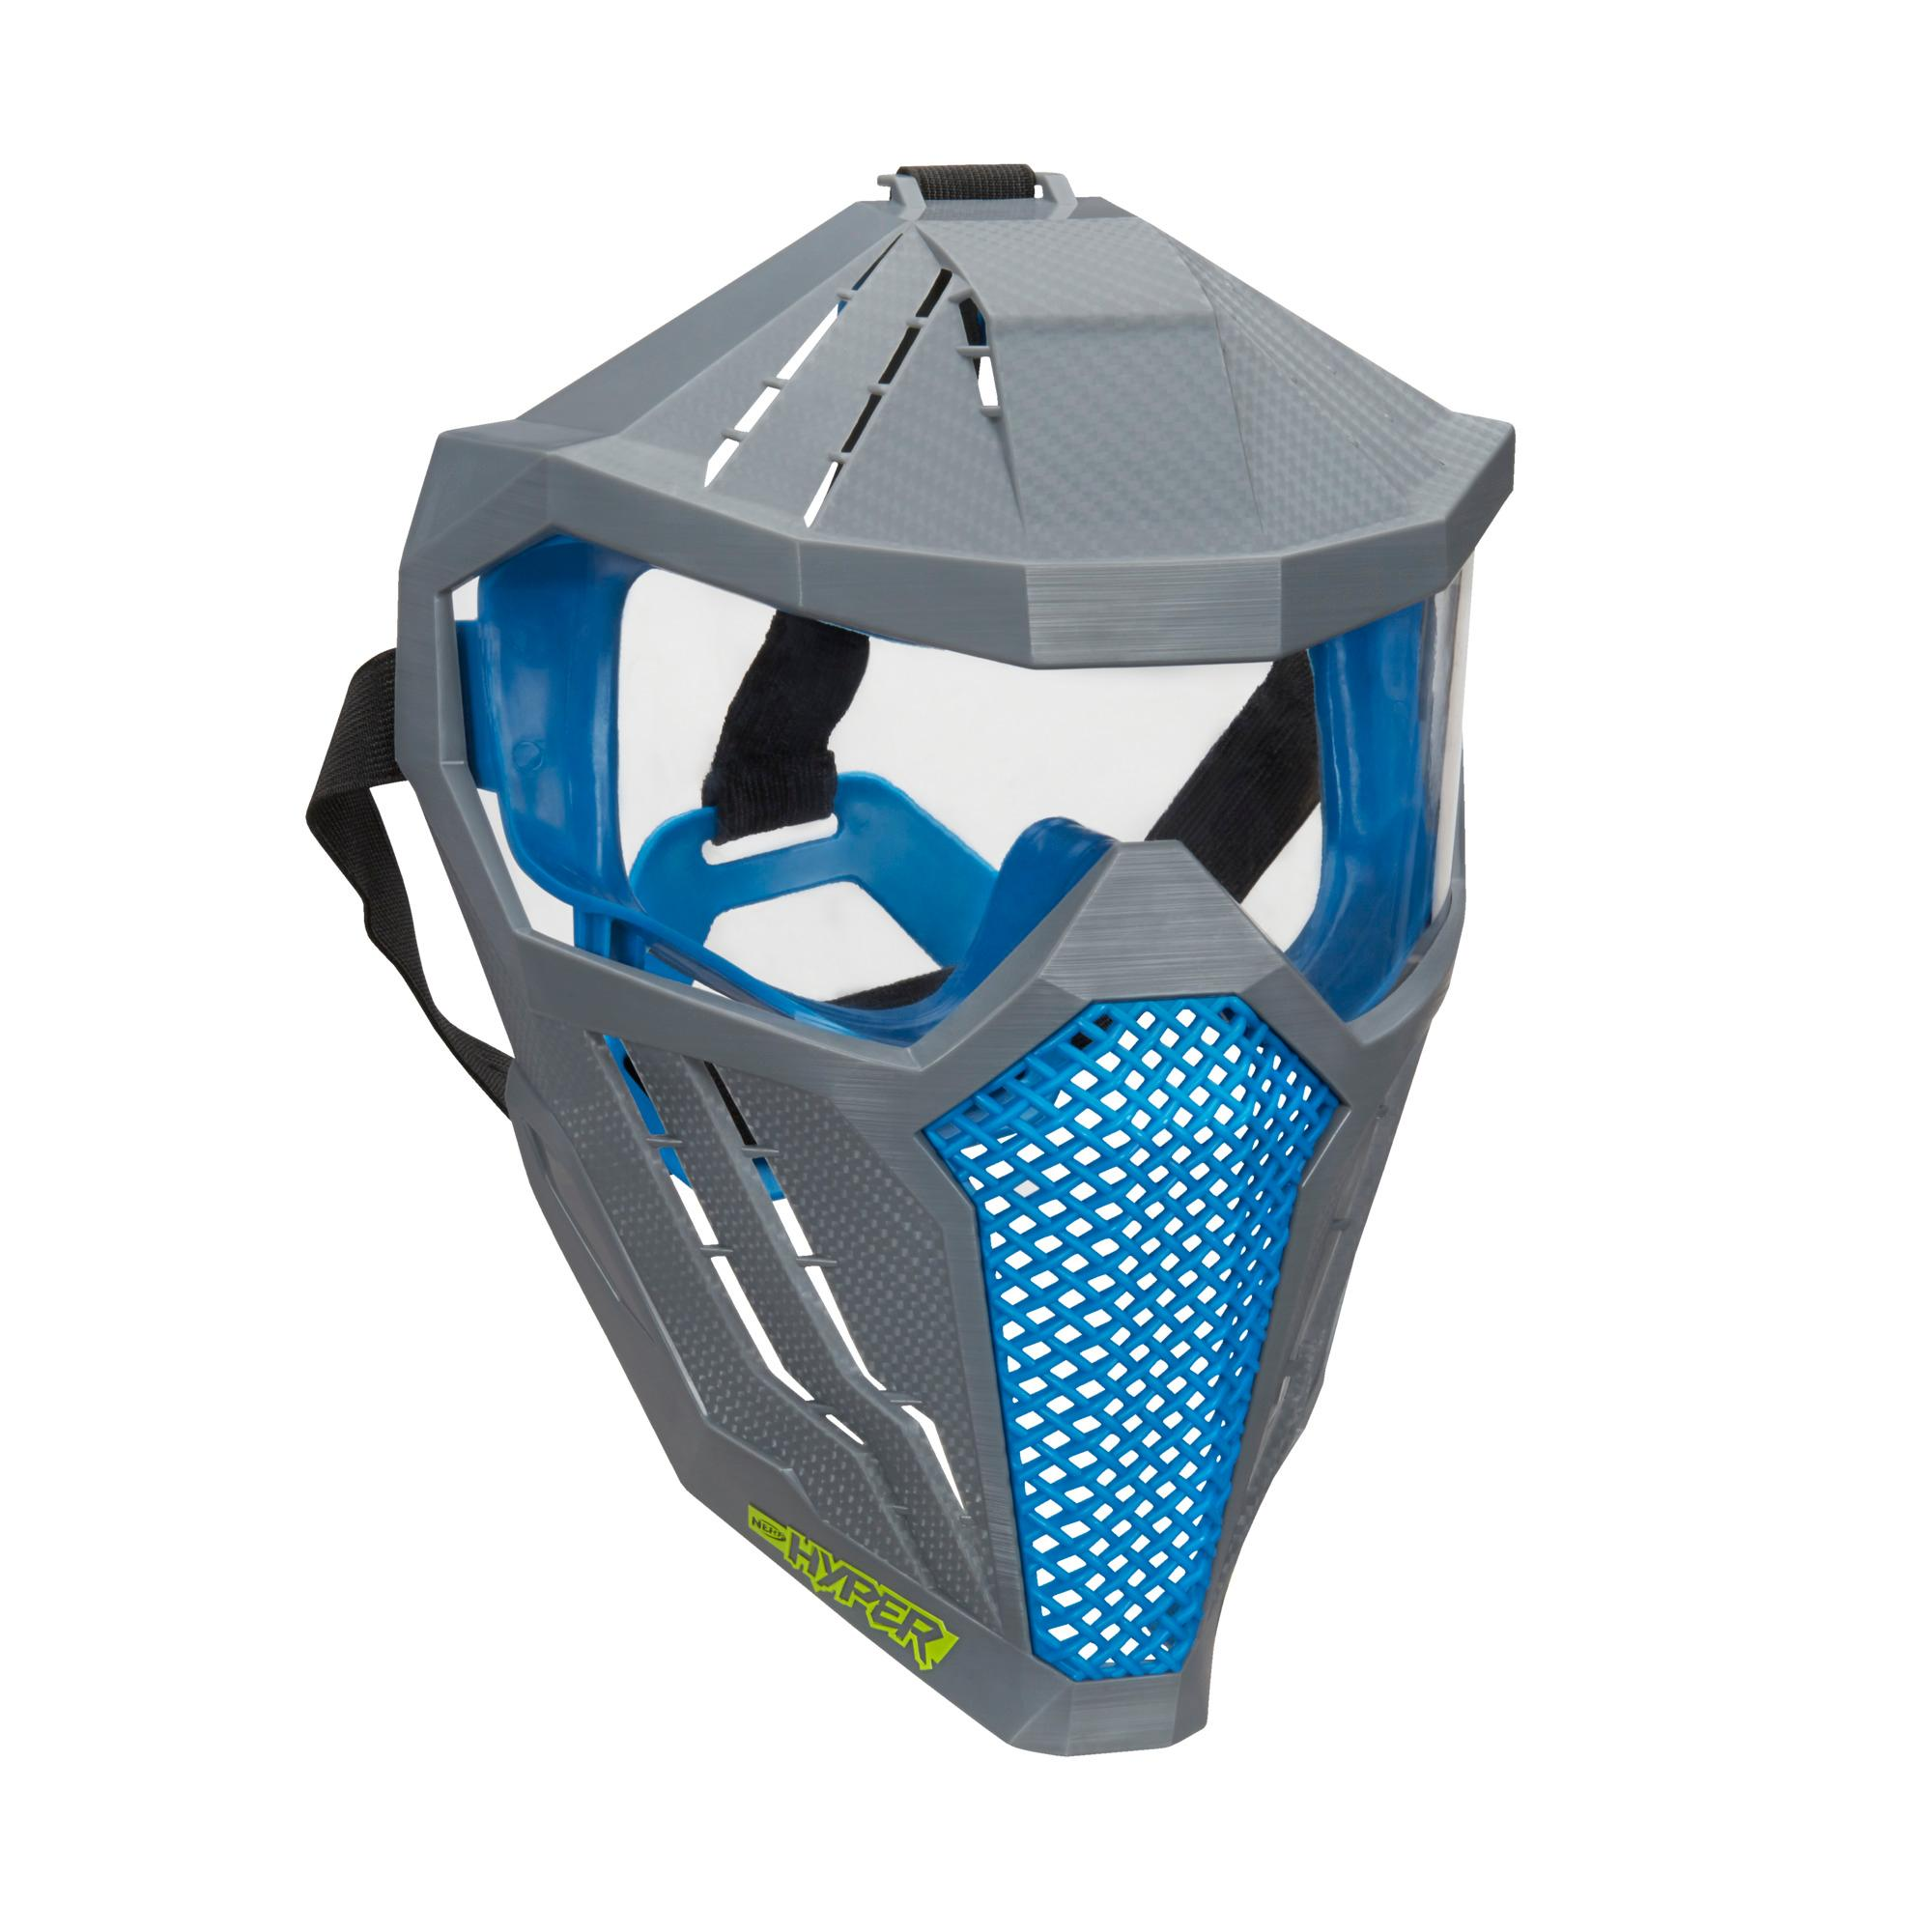 Nerf Hyper Face Mask -- Breathable Design, Adjustable Head Strap -- Blue Team Color -- For Teens, Adults